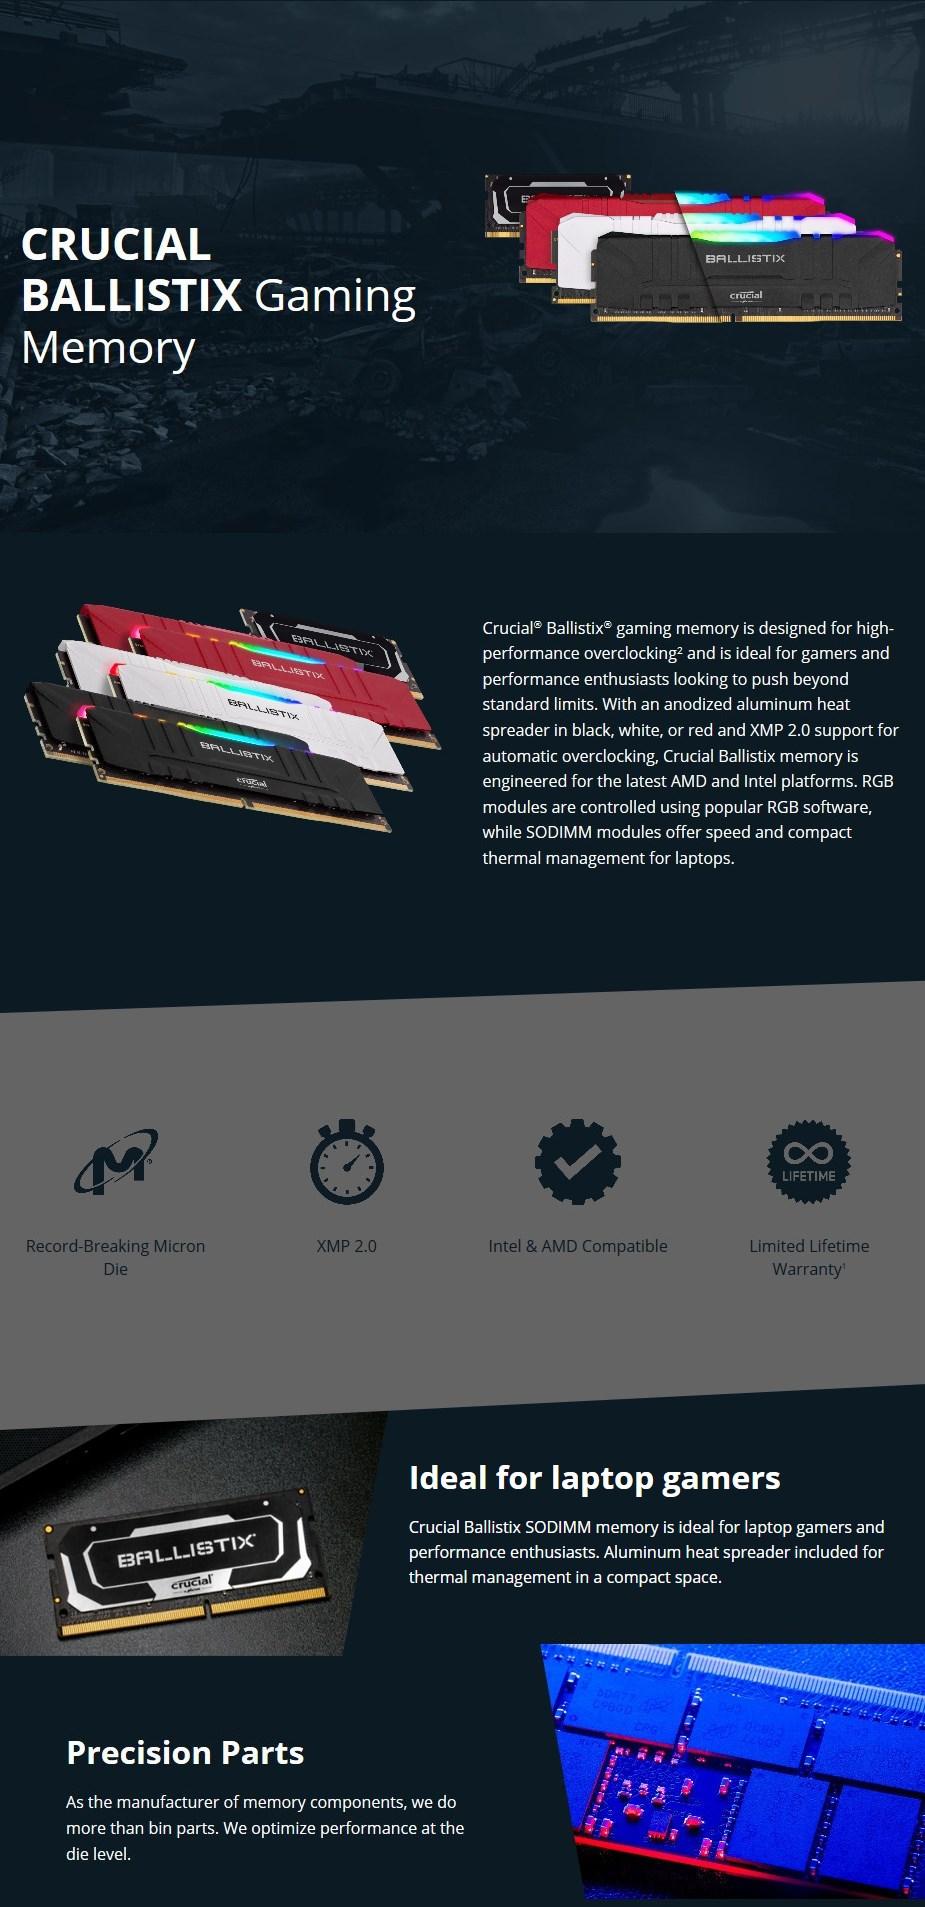 rucial Ballistix 64GB (2x 32GB) DDR4 3200MHz SODIMM Memory - Black - Overview 1